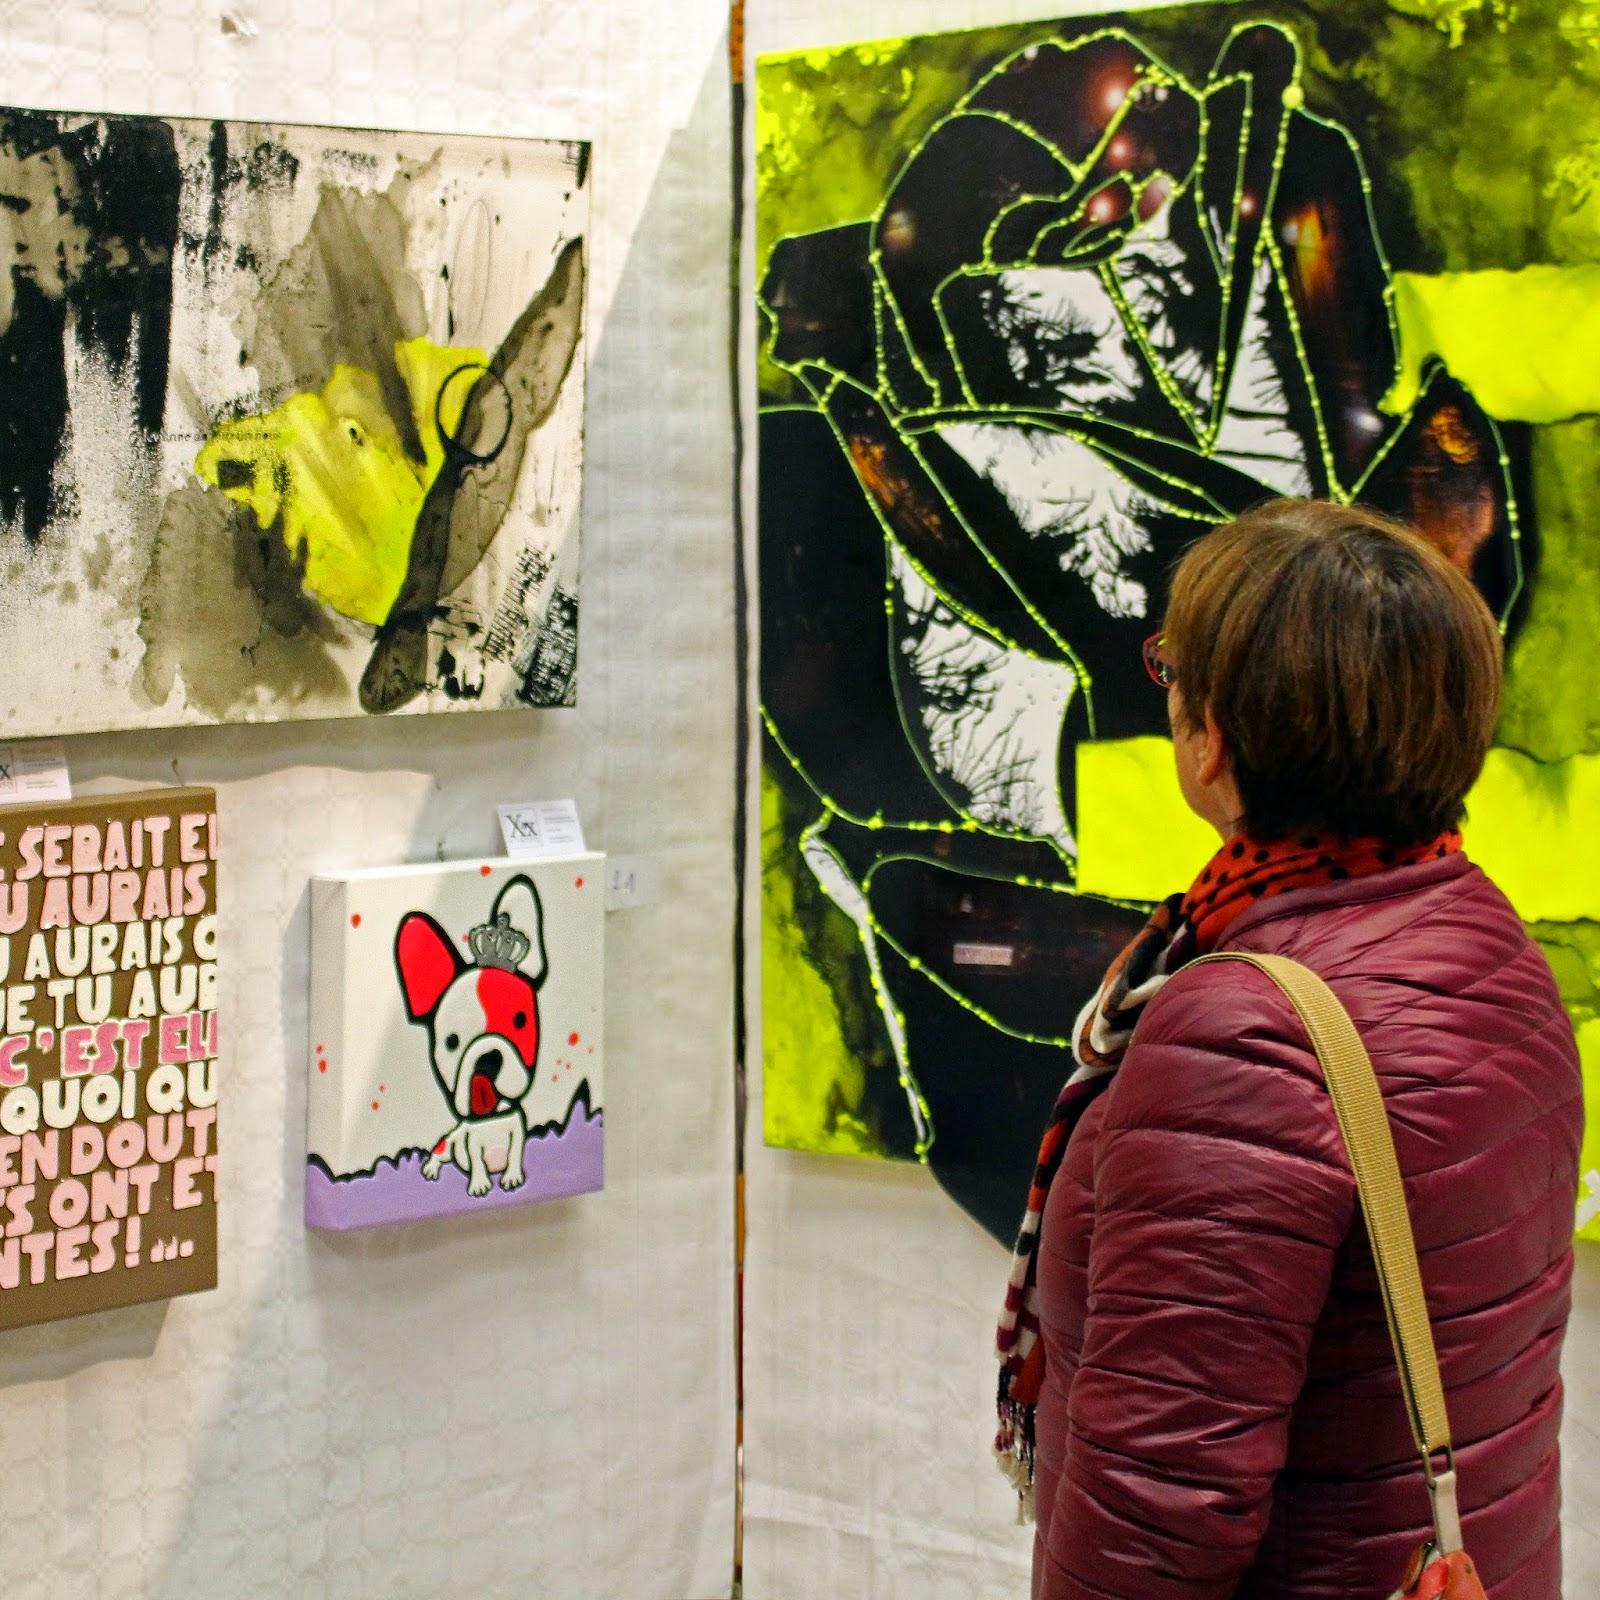 http://xx-gallery.blogspot.be/2014/11/salle-henri-echevin-du-07-au-09-nov-2014.html